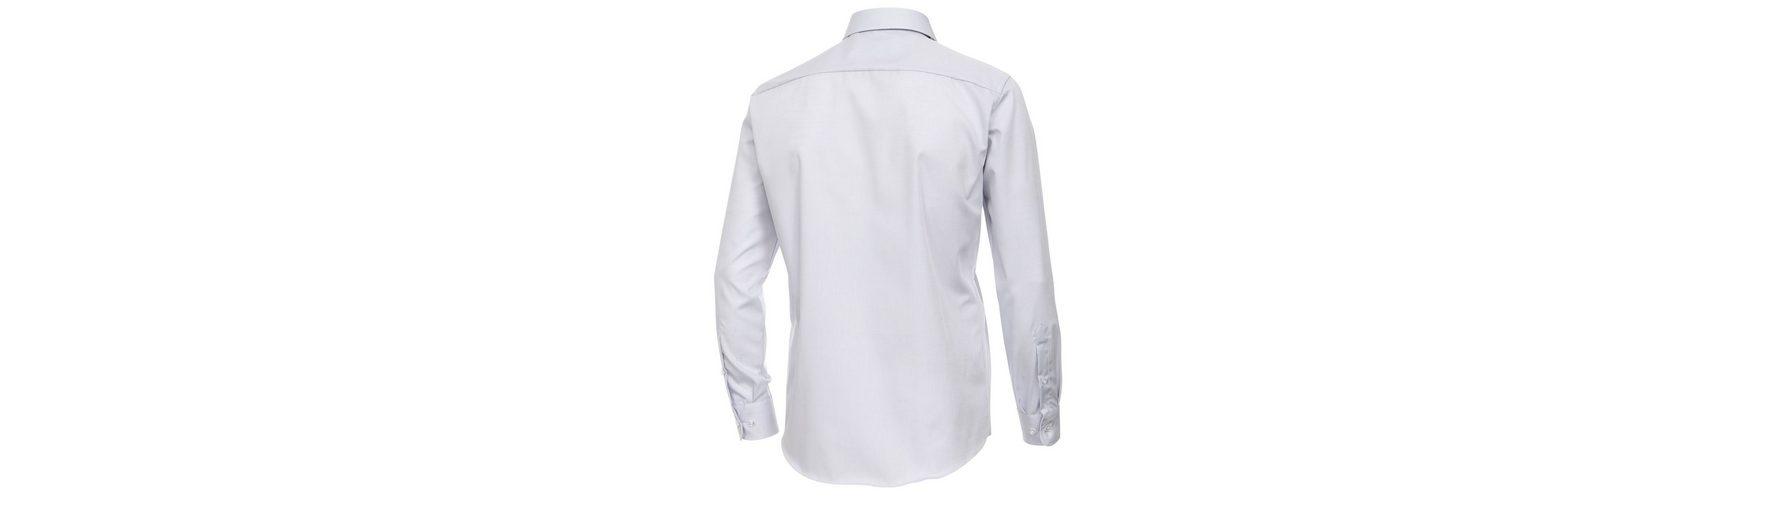 CASAMODA Businesshemd SLIM FIT mit hohem Tragekomfort Kosten 2018 Günstig Online TKI52